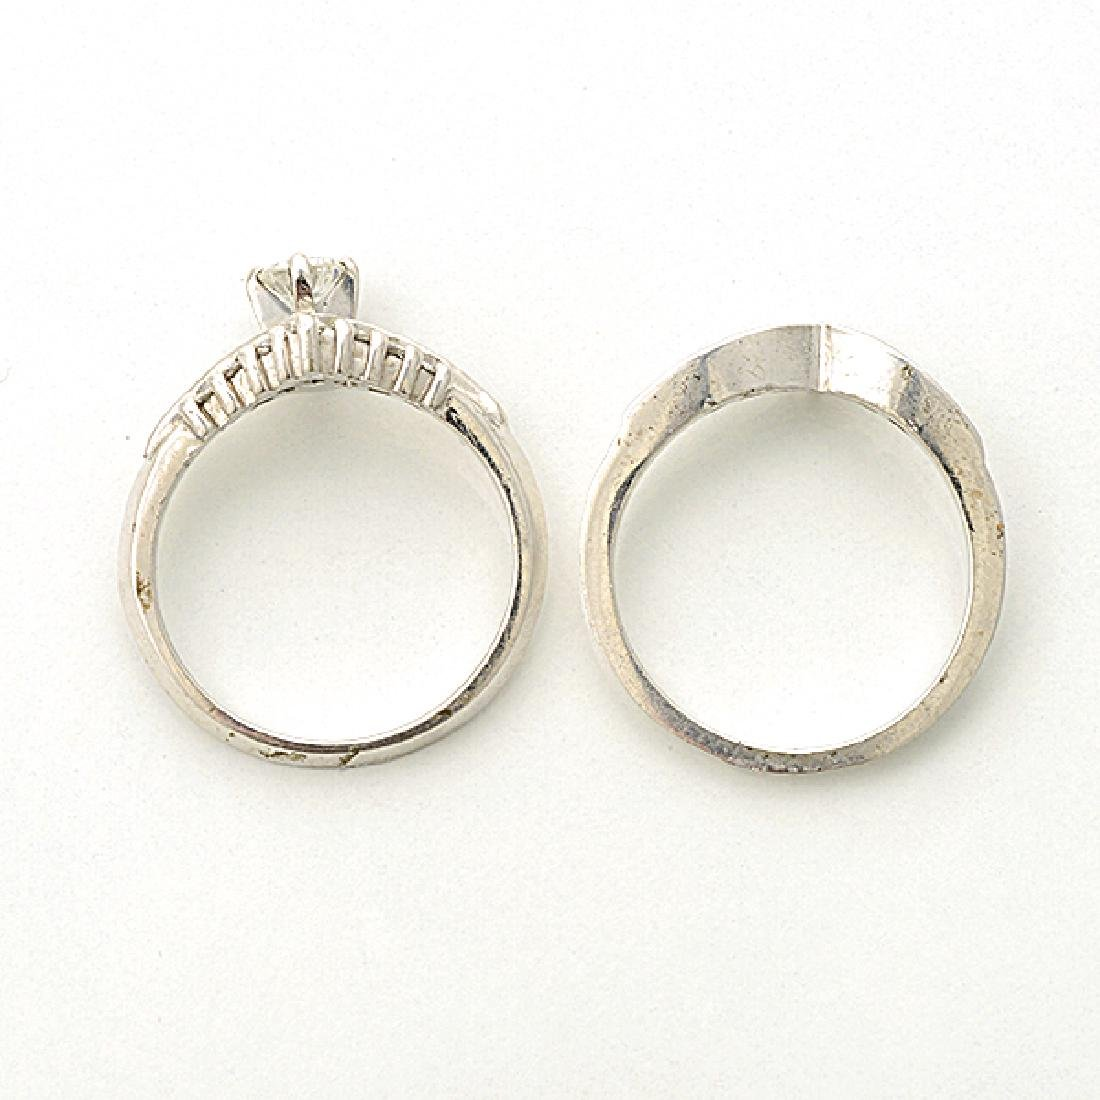 Diamond, 14k White Gold Ring Set. - 3